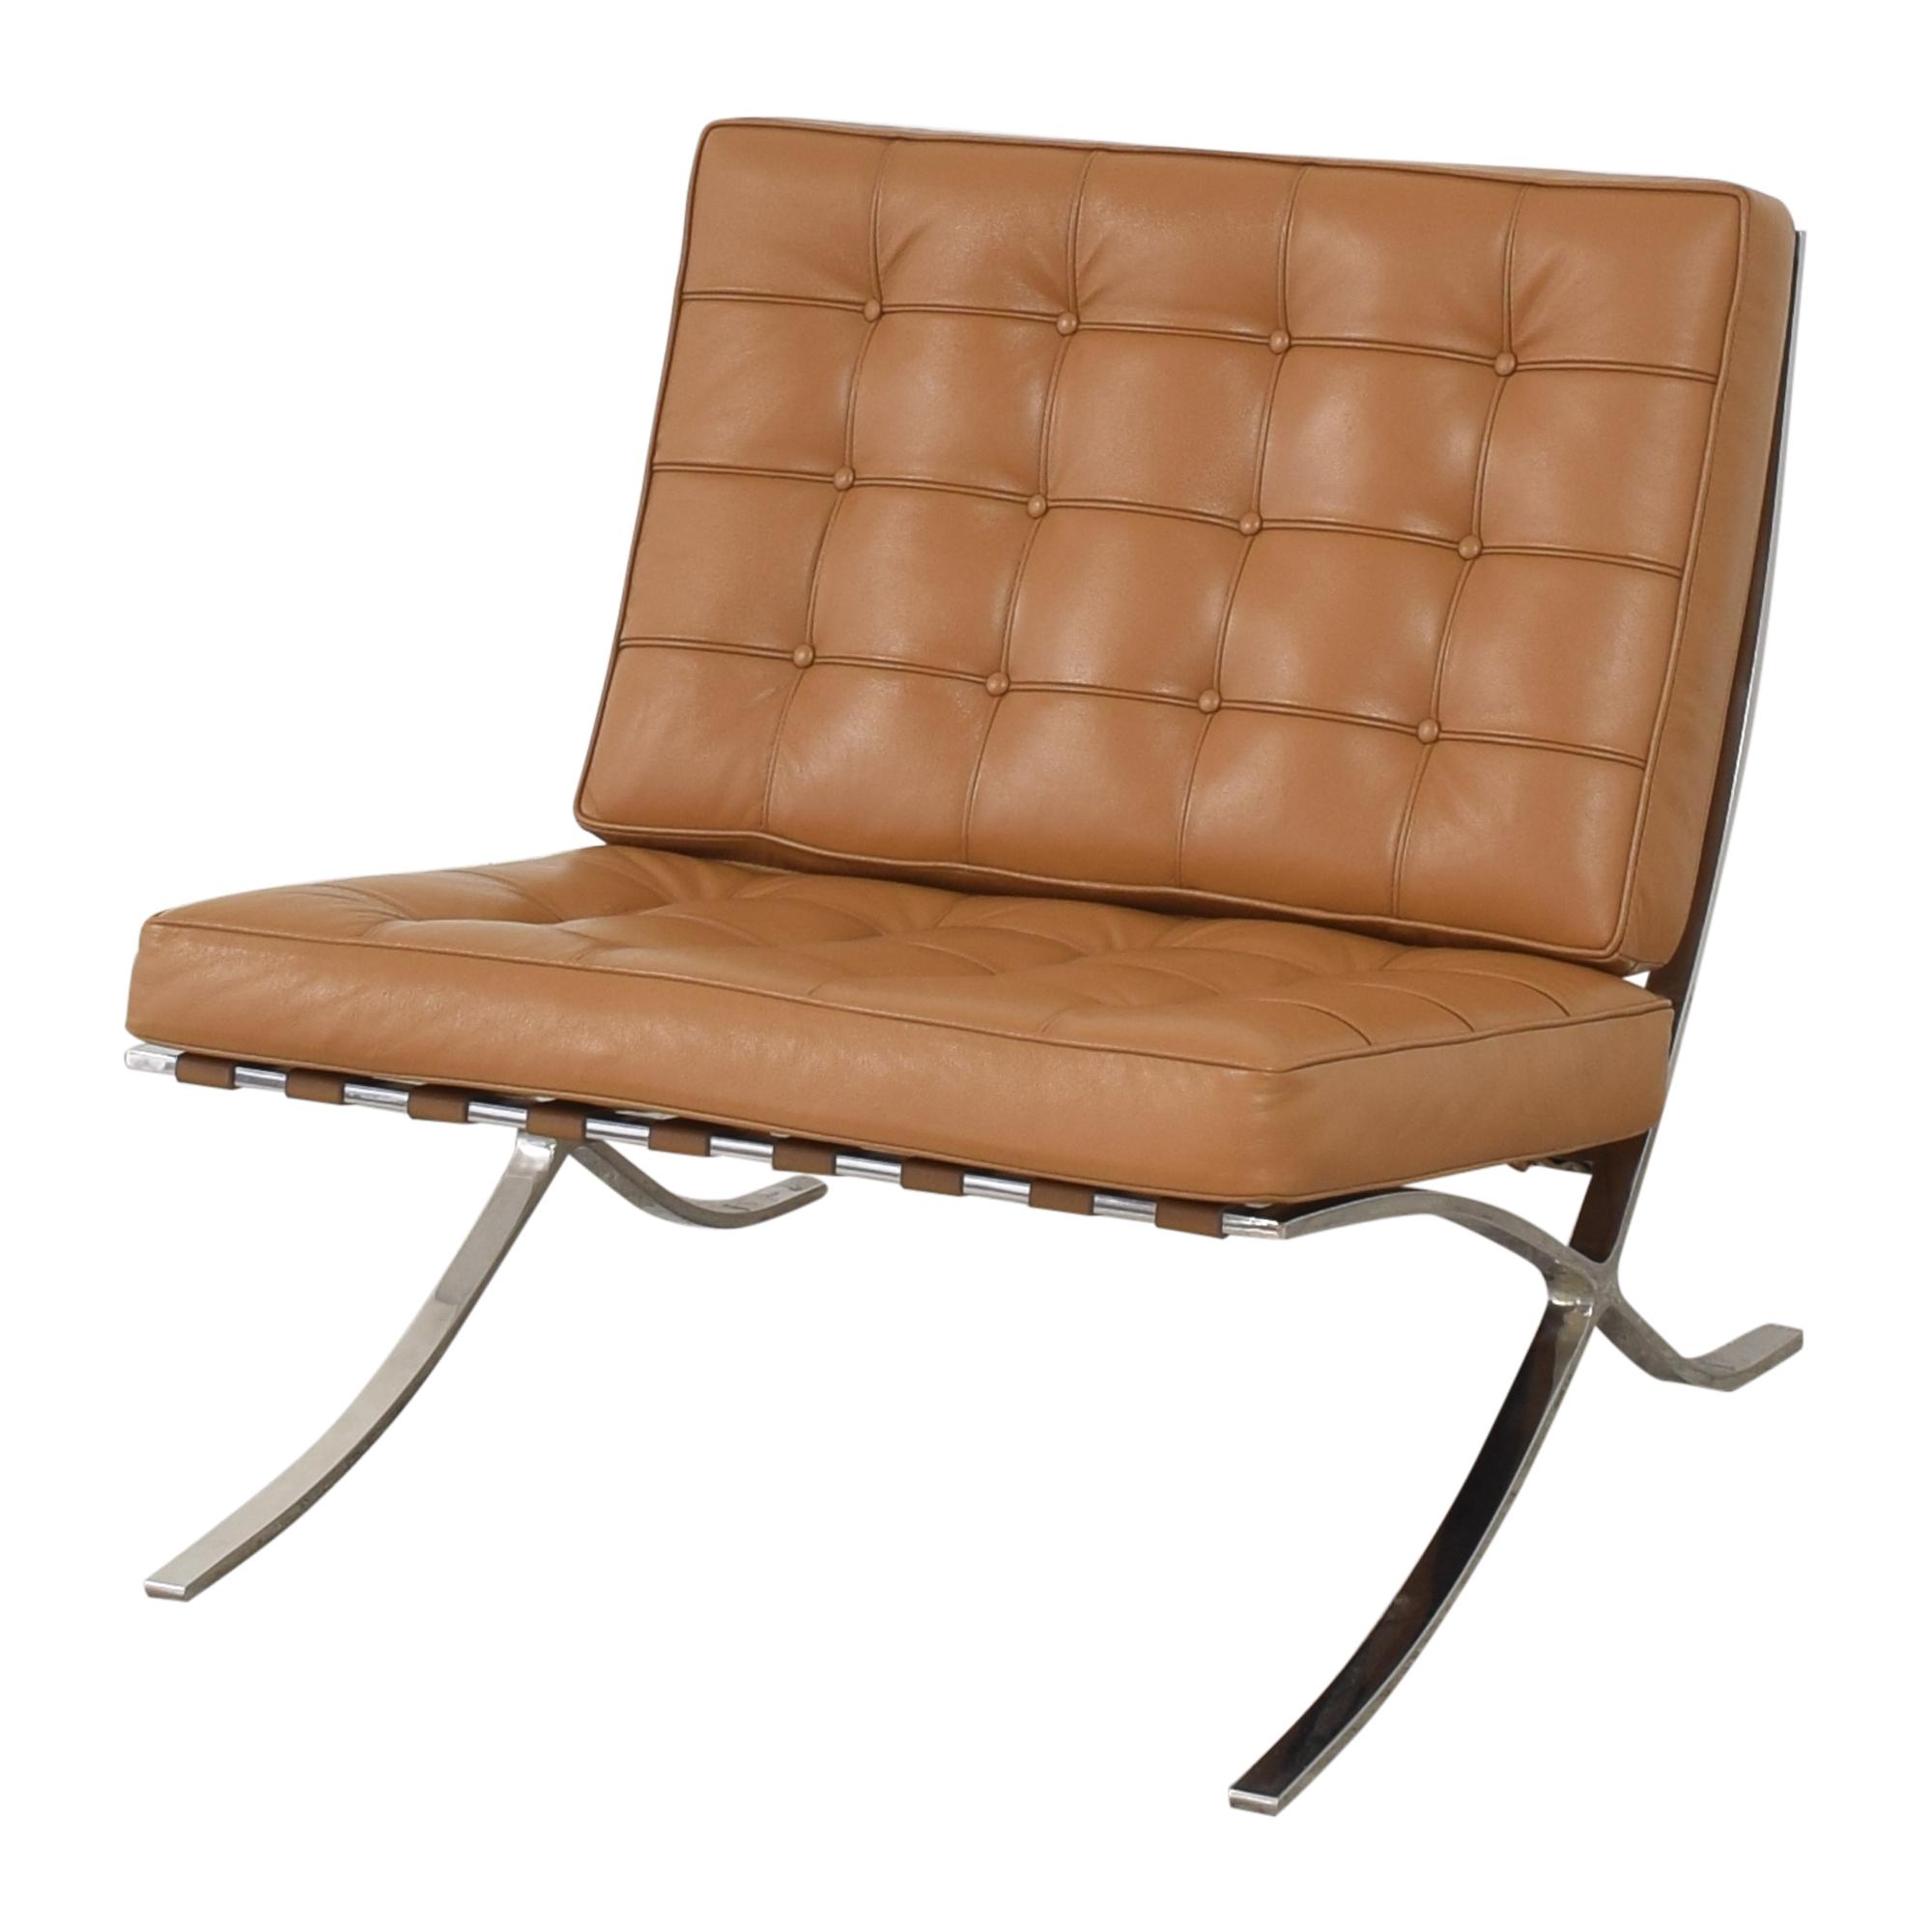 Modern Classics Modern Classics Barcelona Chair Replica nj